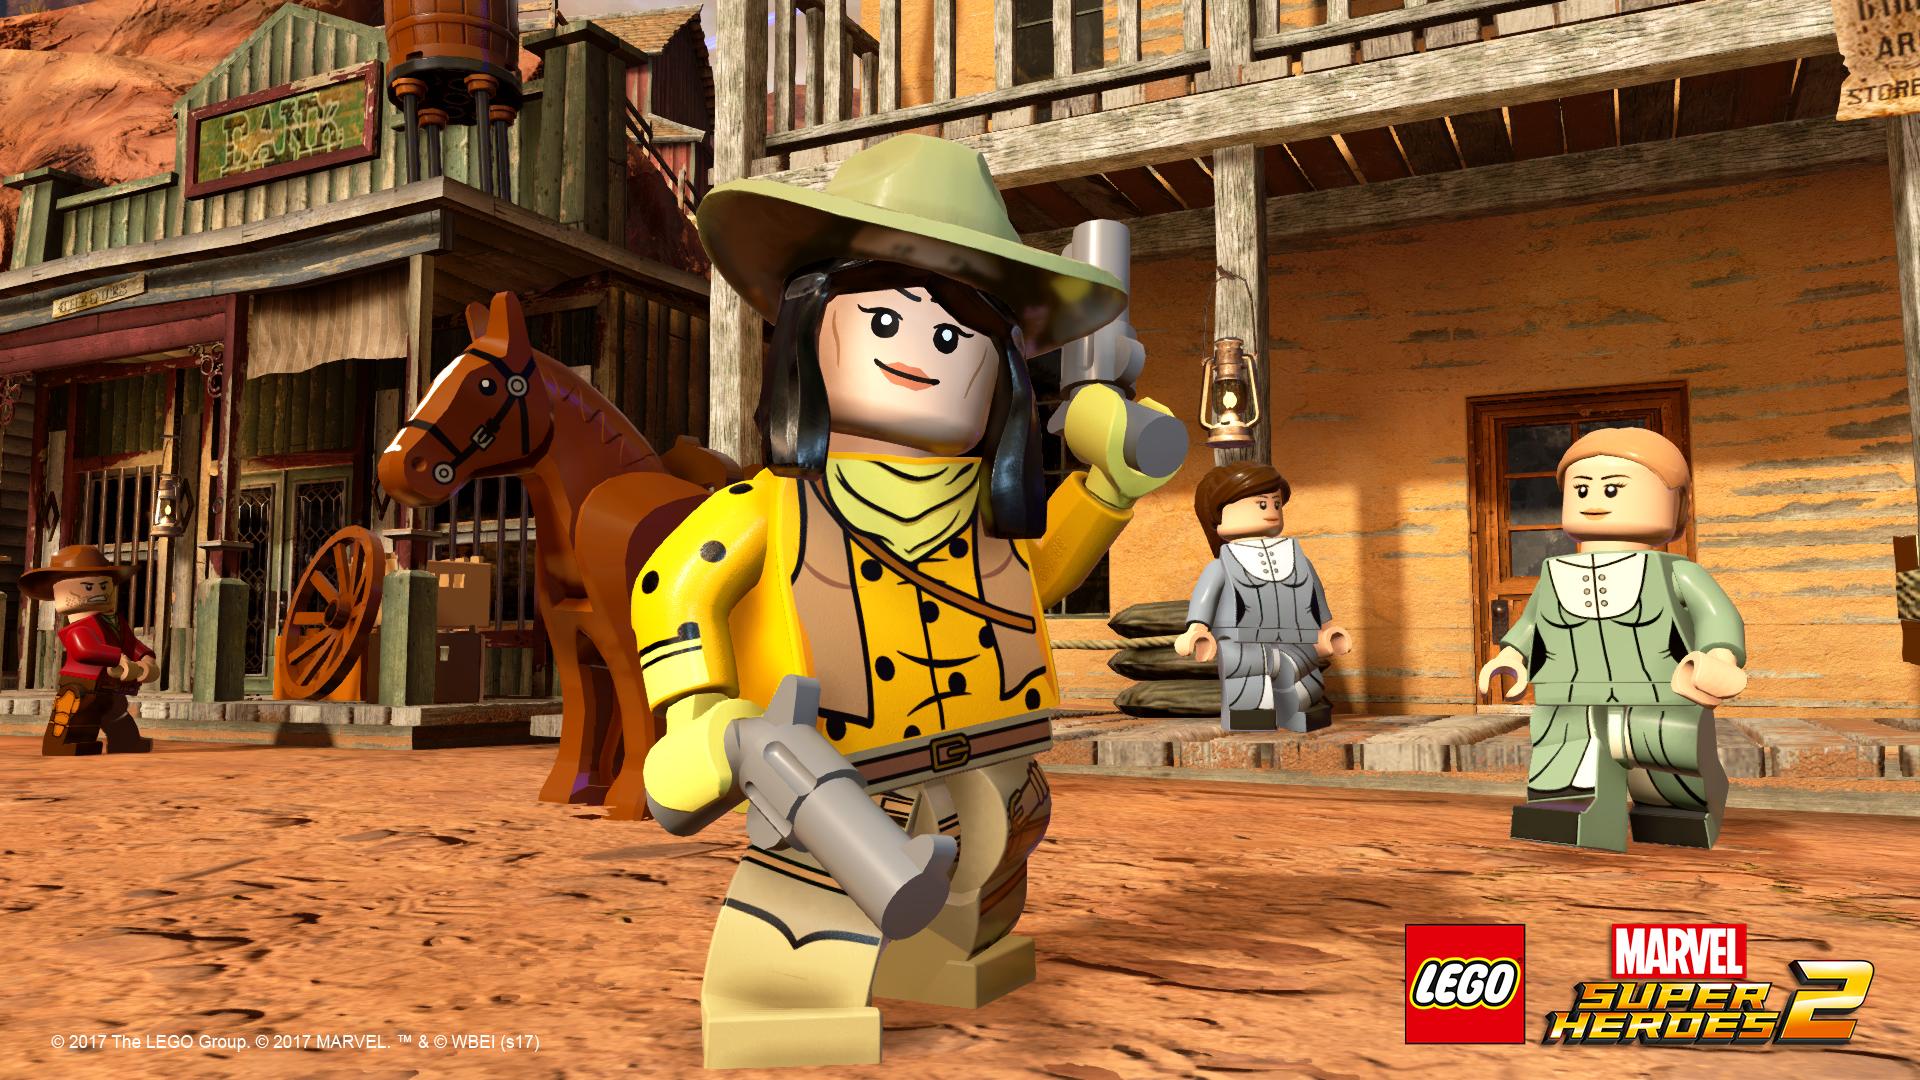 LEGO_Marvel_Super_Heroes_2_-_Arizona_Annie_2_1507794987